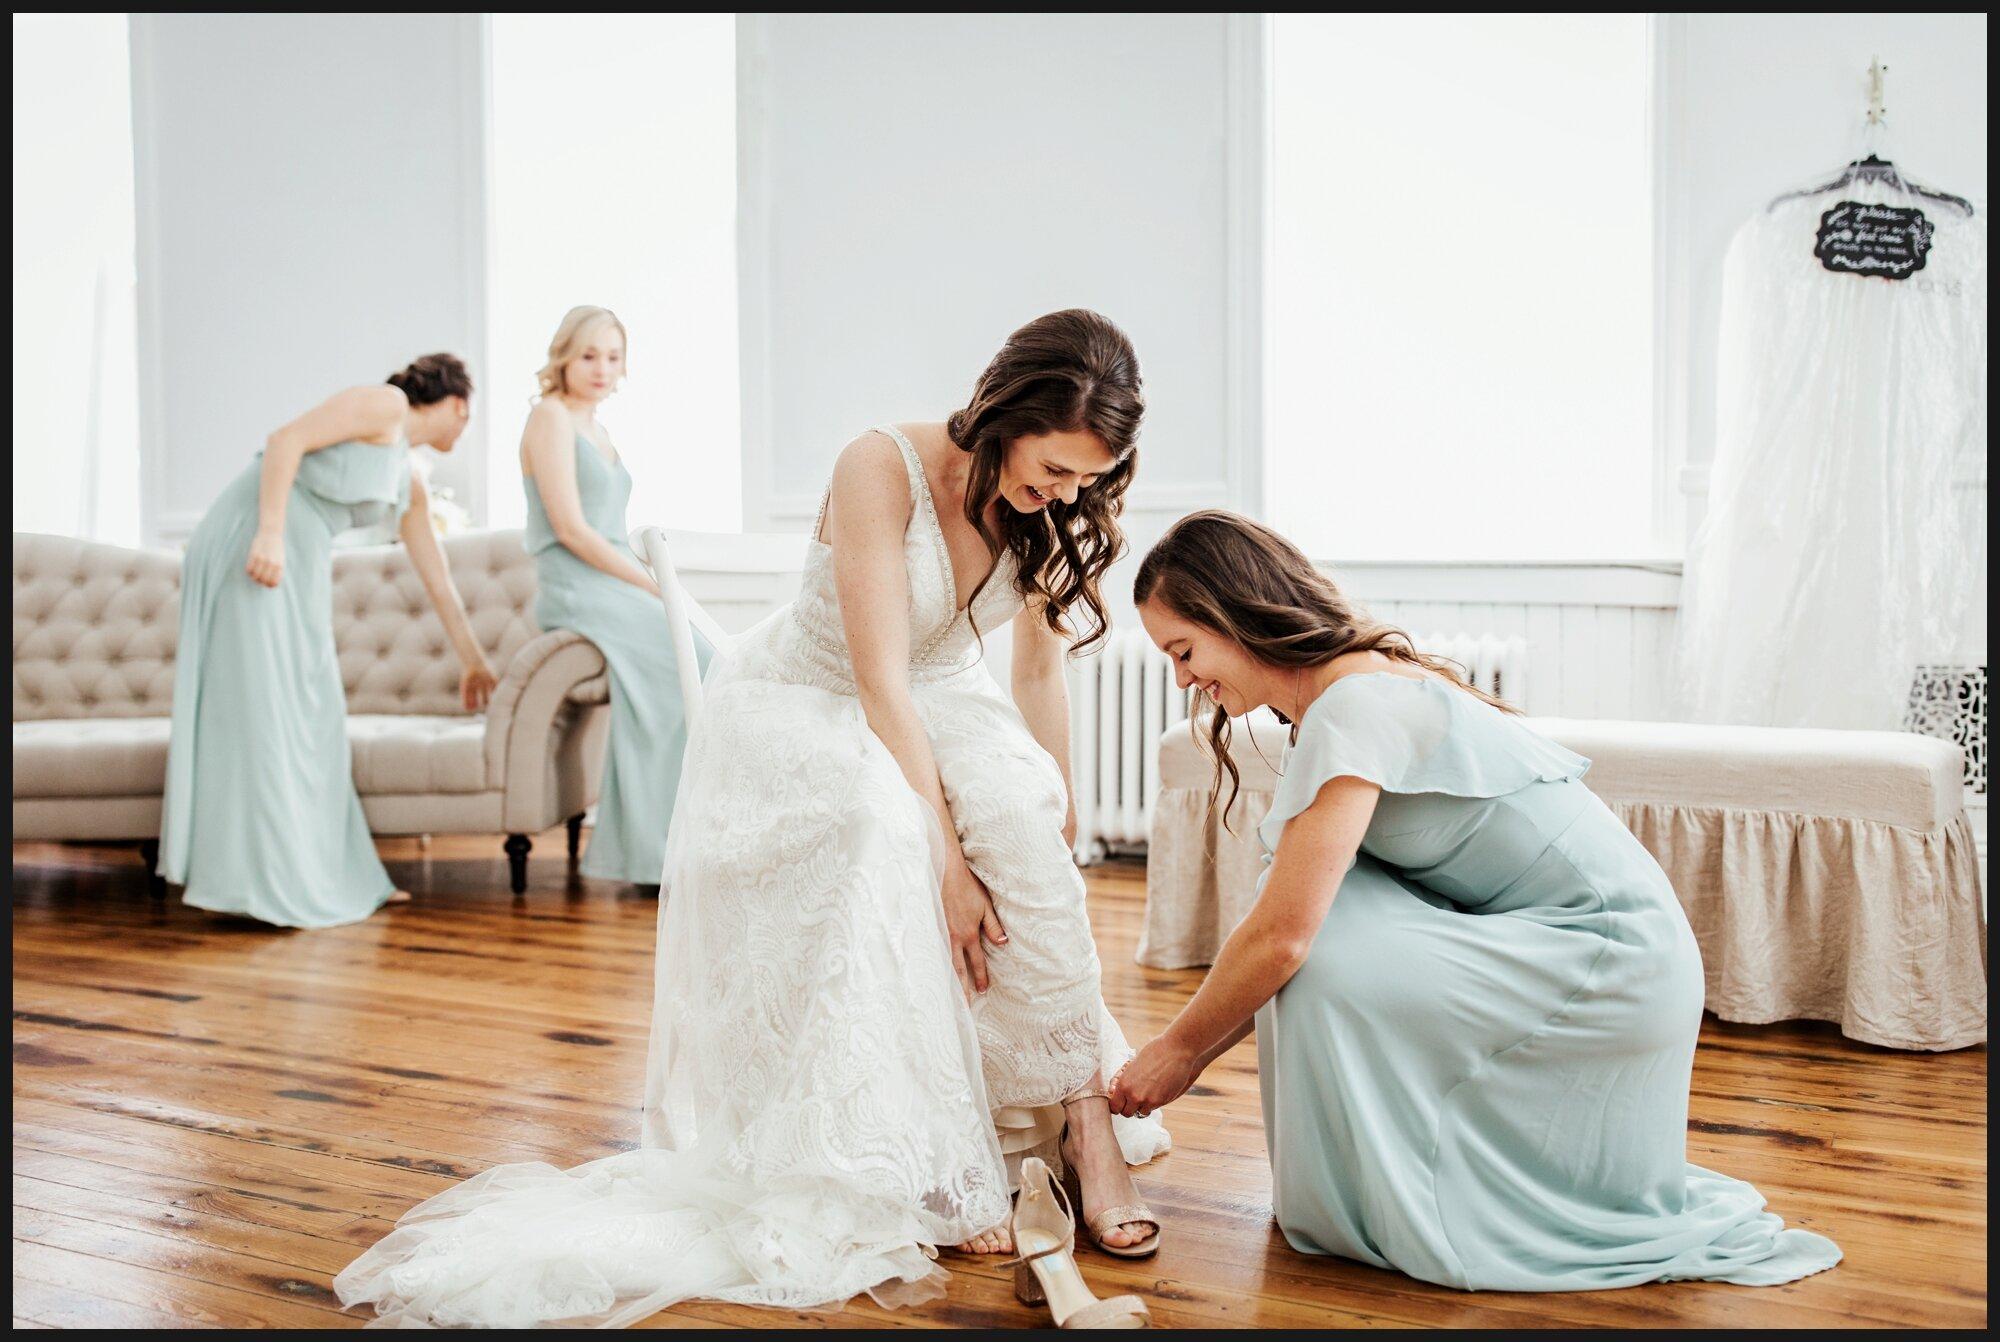 Orlando-Wedding-Photographer-destination-wedding-photographer-florida-wedding-photographer-hawaii-wedding-photographer_0653.jpg